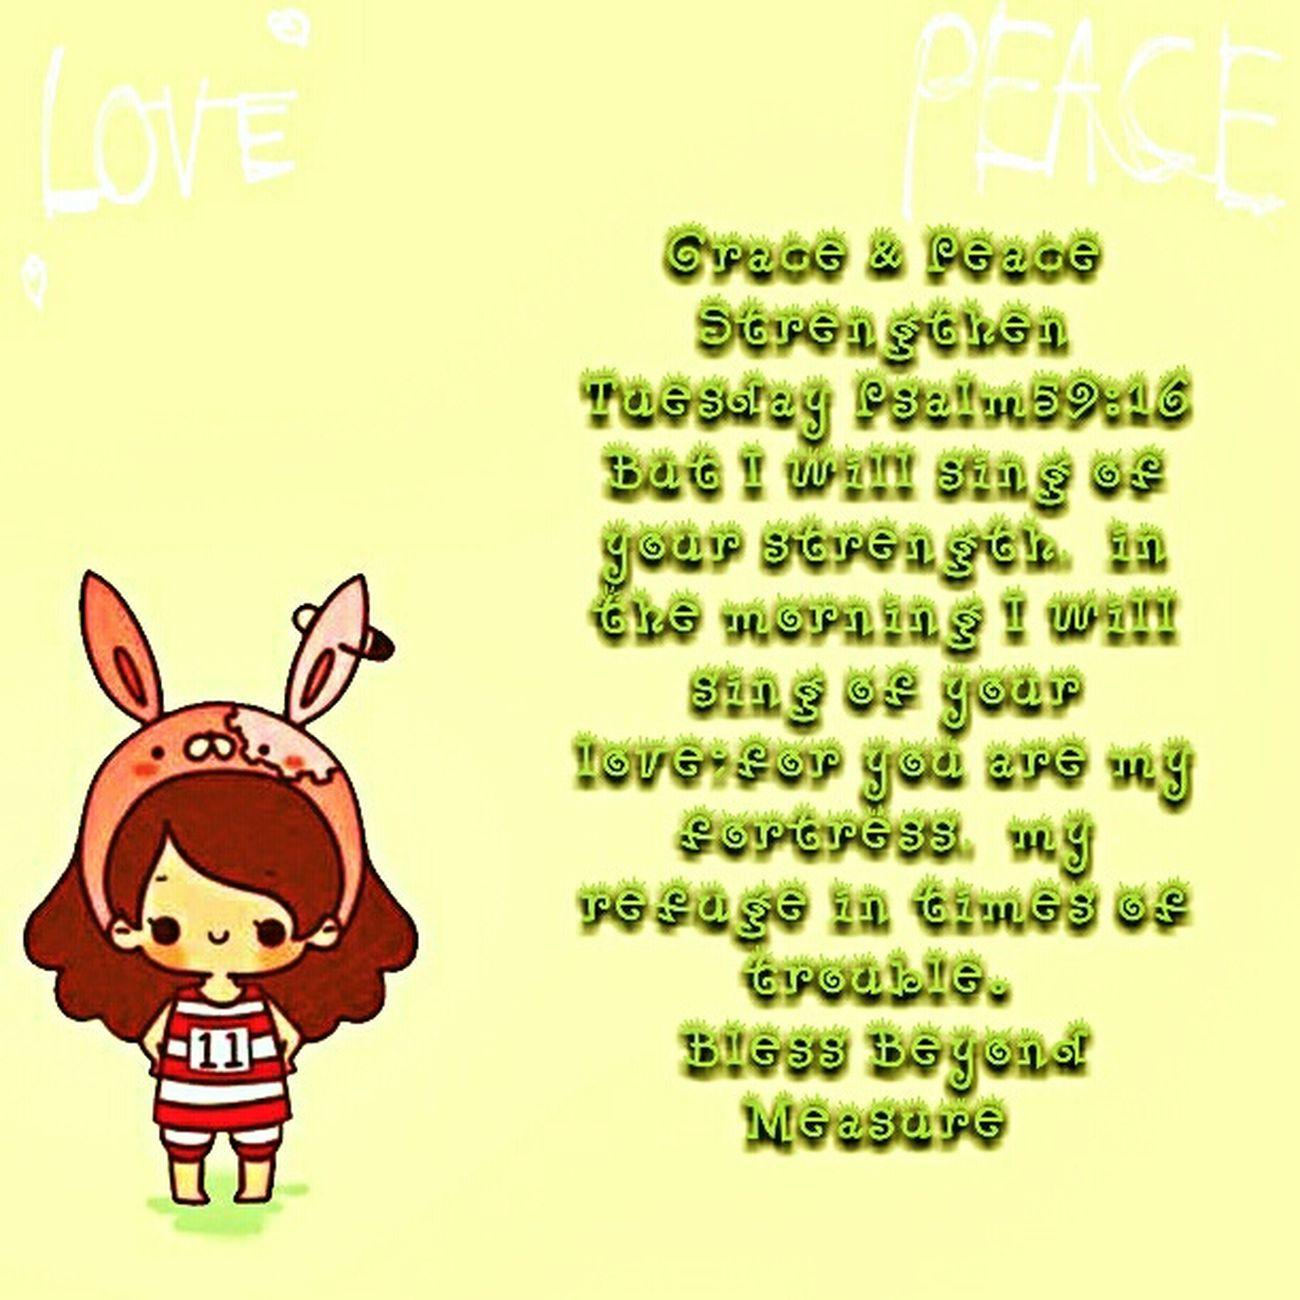 Grace & Peace Strengthen Tuesday